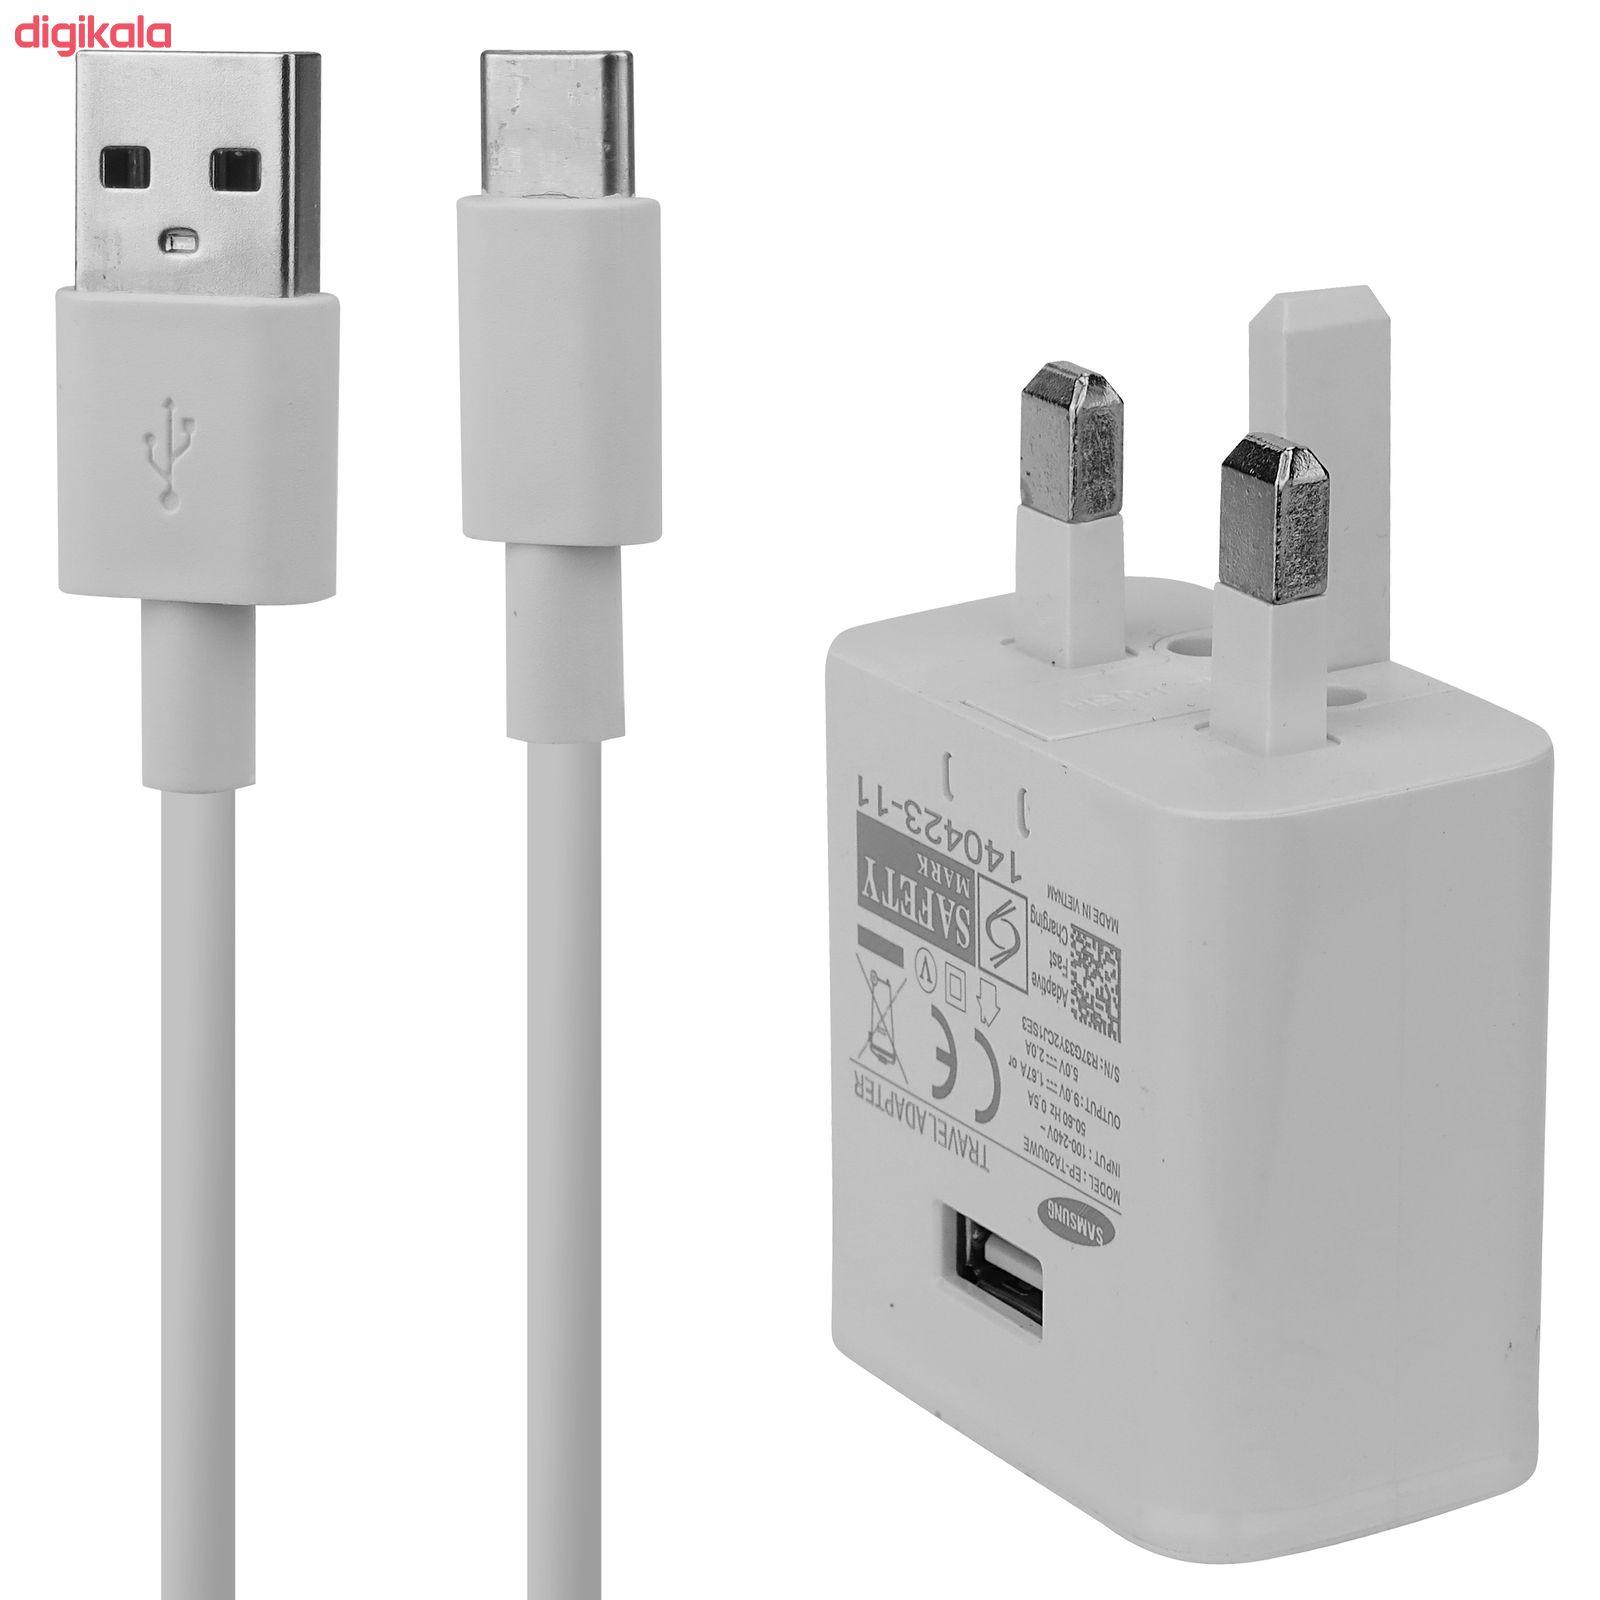 شارژر دیواری مدل EP-TA20UWE به همراه کابل تبدیل USB-C  main 1 1